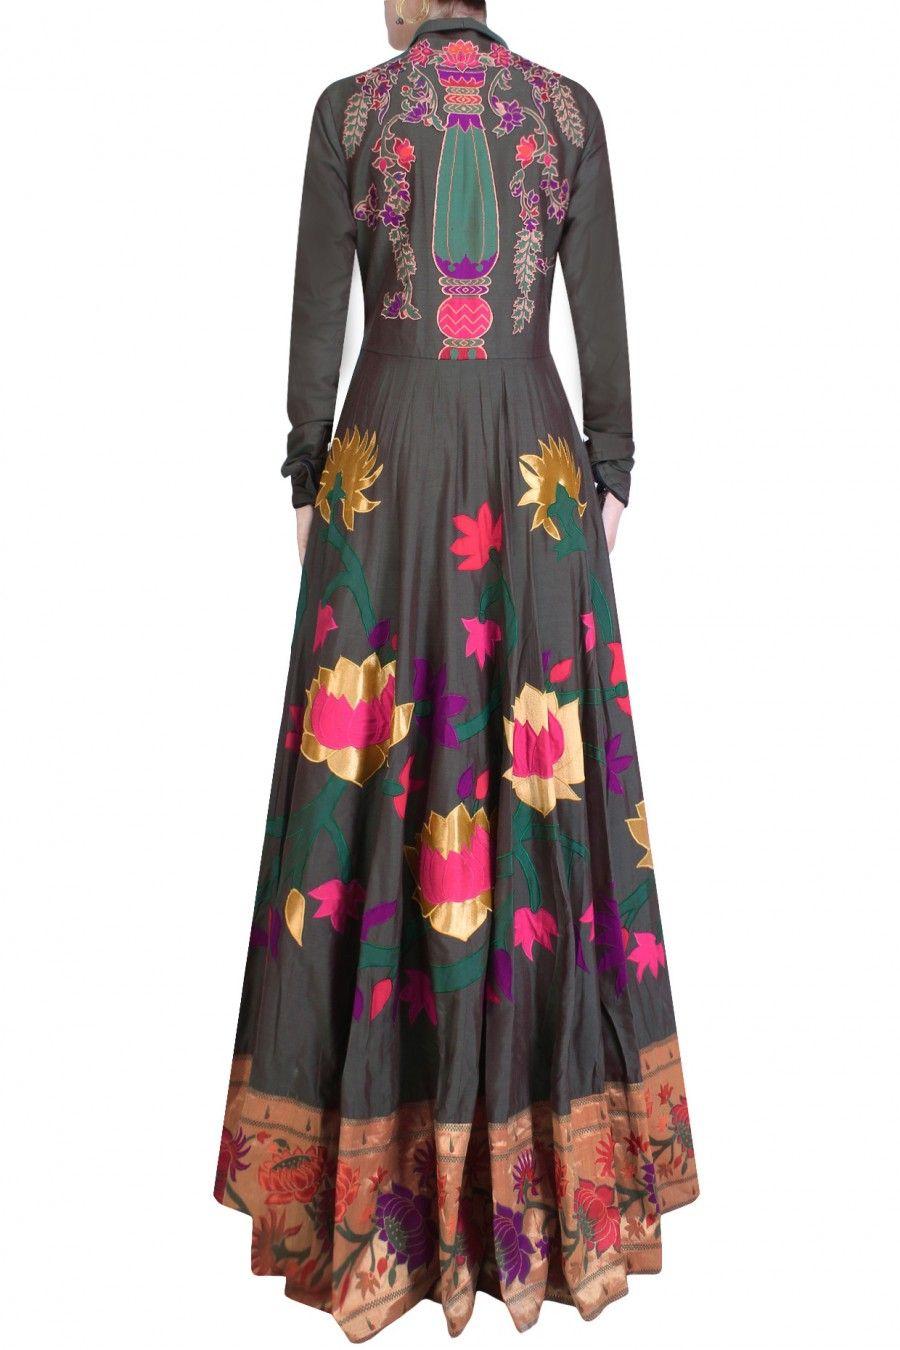 5c9fca732cb Neeta Lulla Indian Attire, Indian Wear, Indian Suits, New Kurti, Neeta Lulla